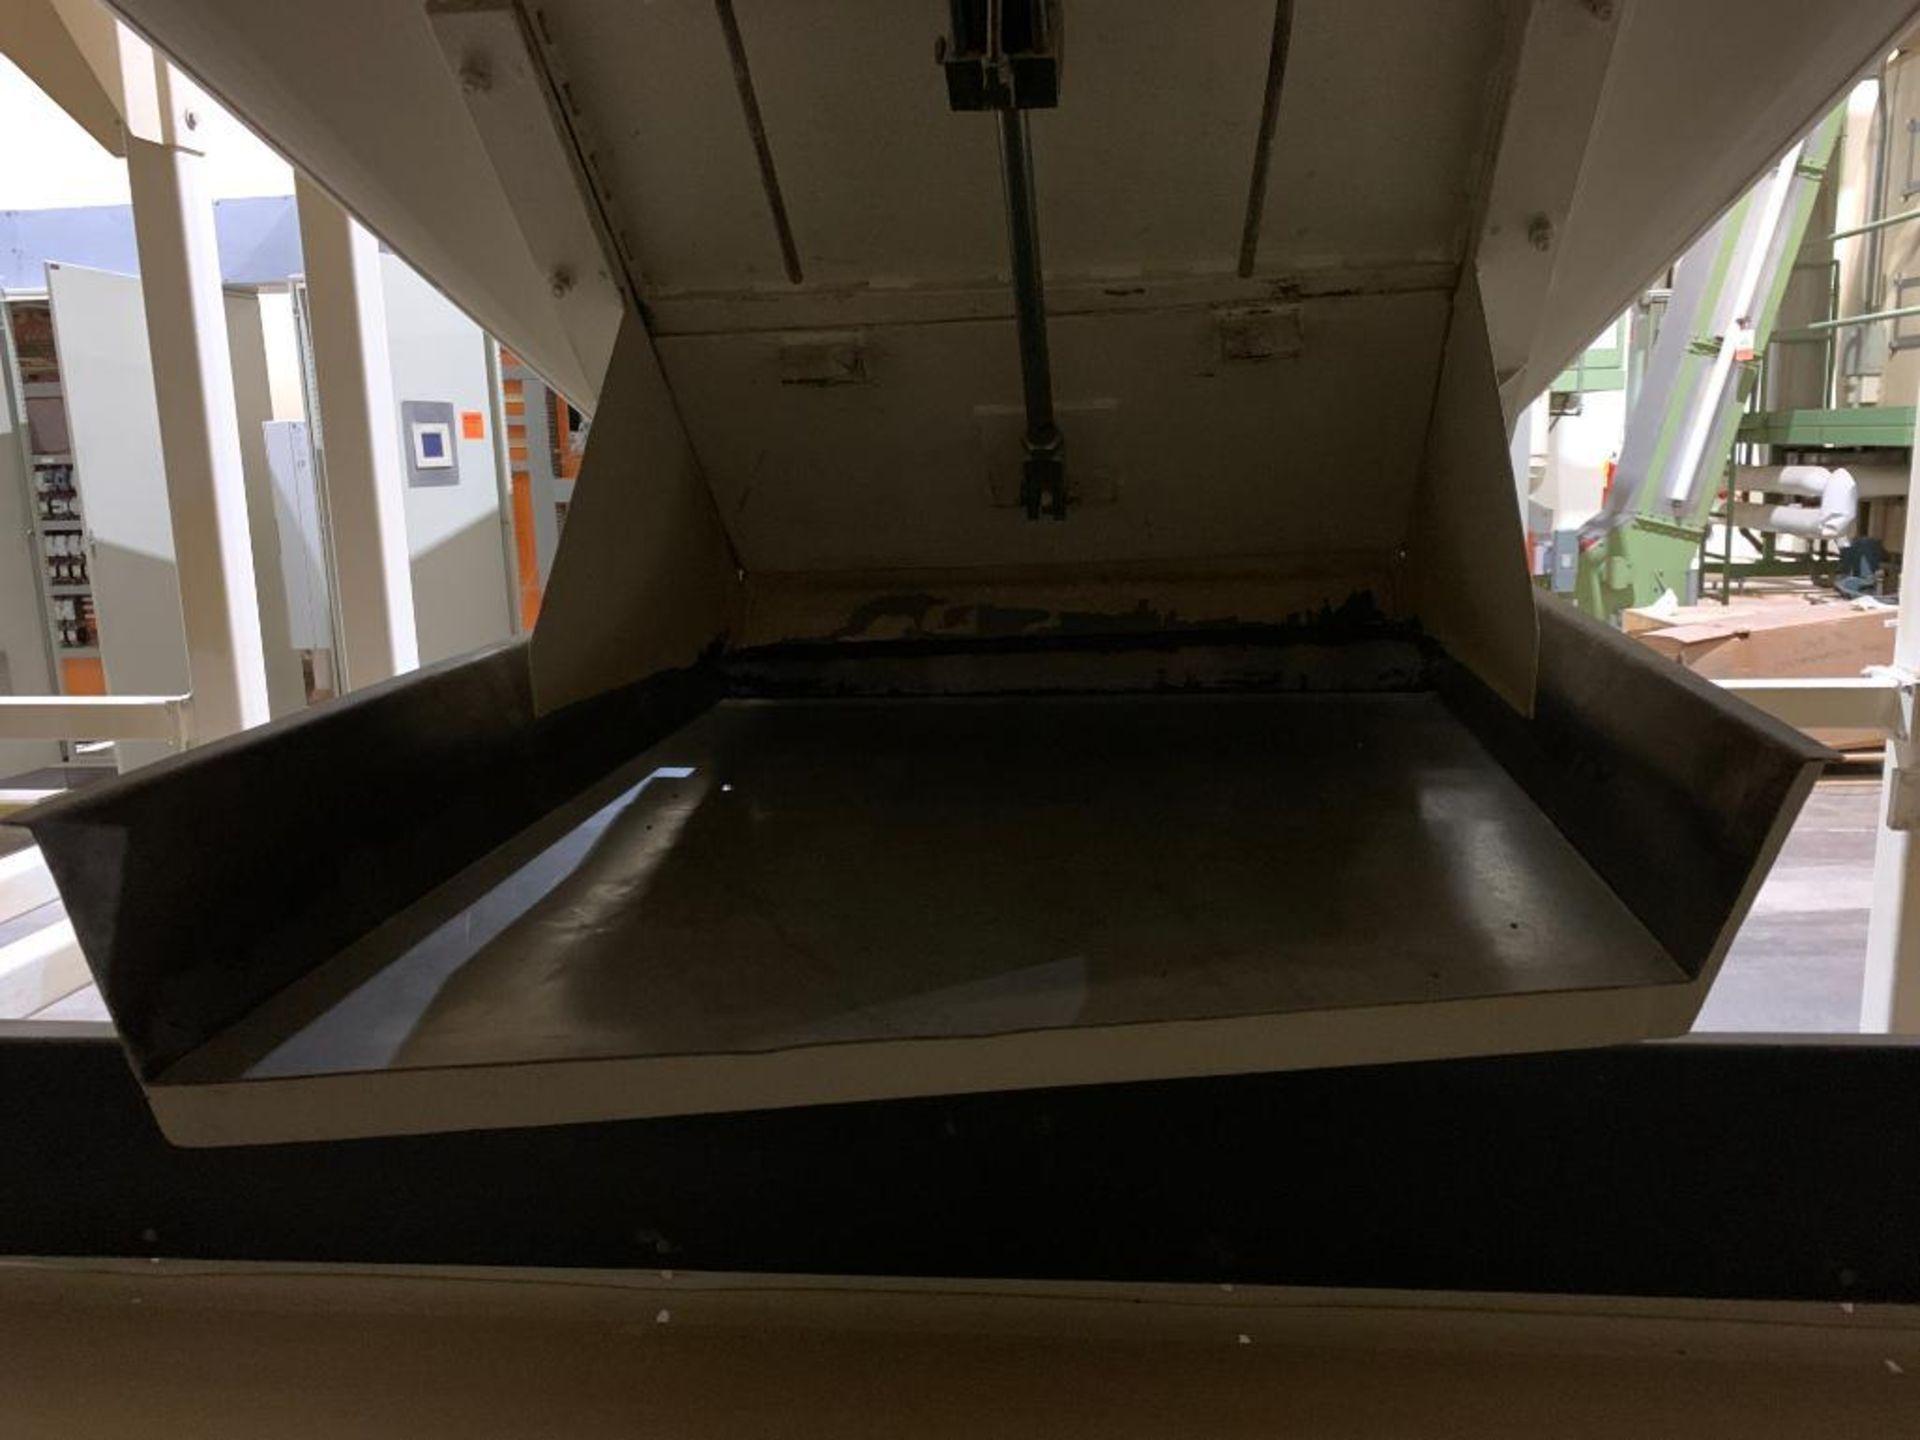 Aseeco mild steel cone bottom bulk storage bin - Image 17 of 27